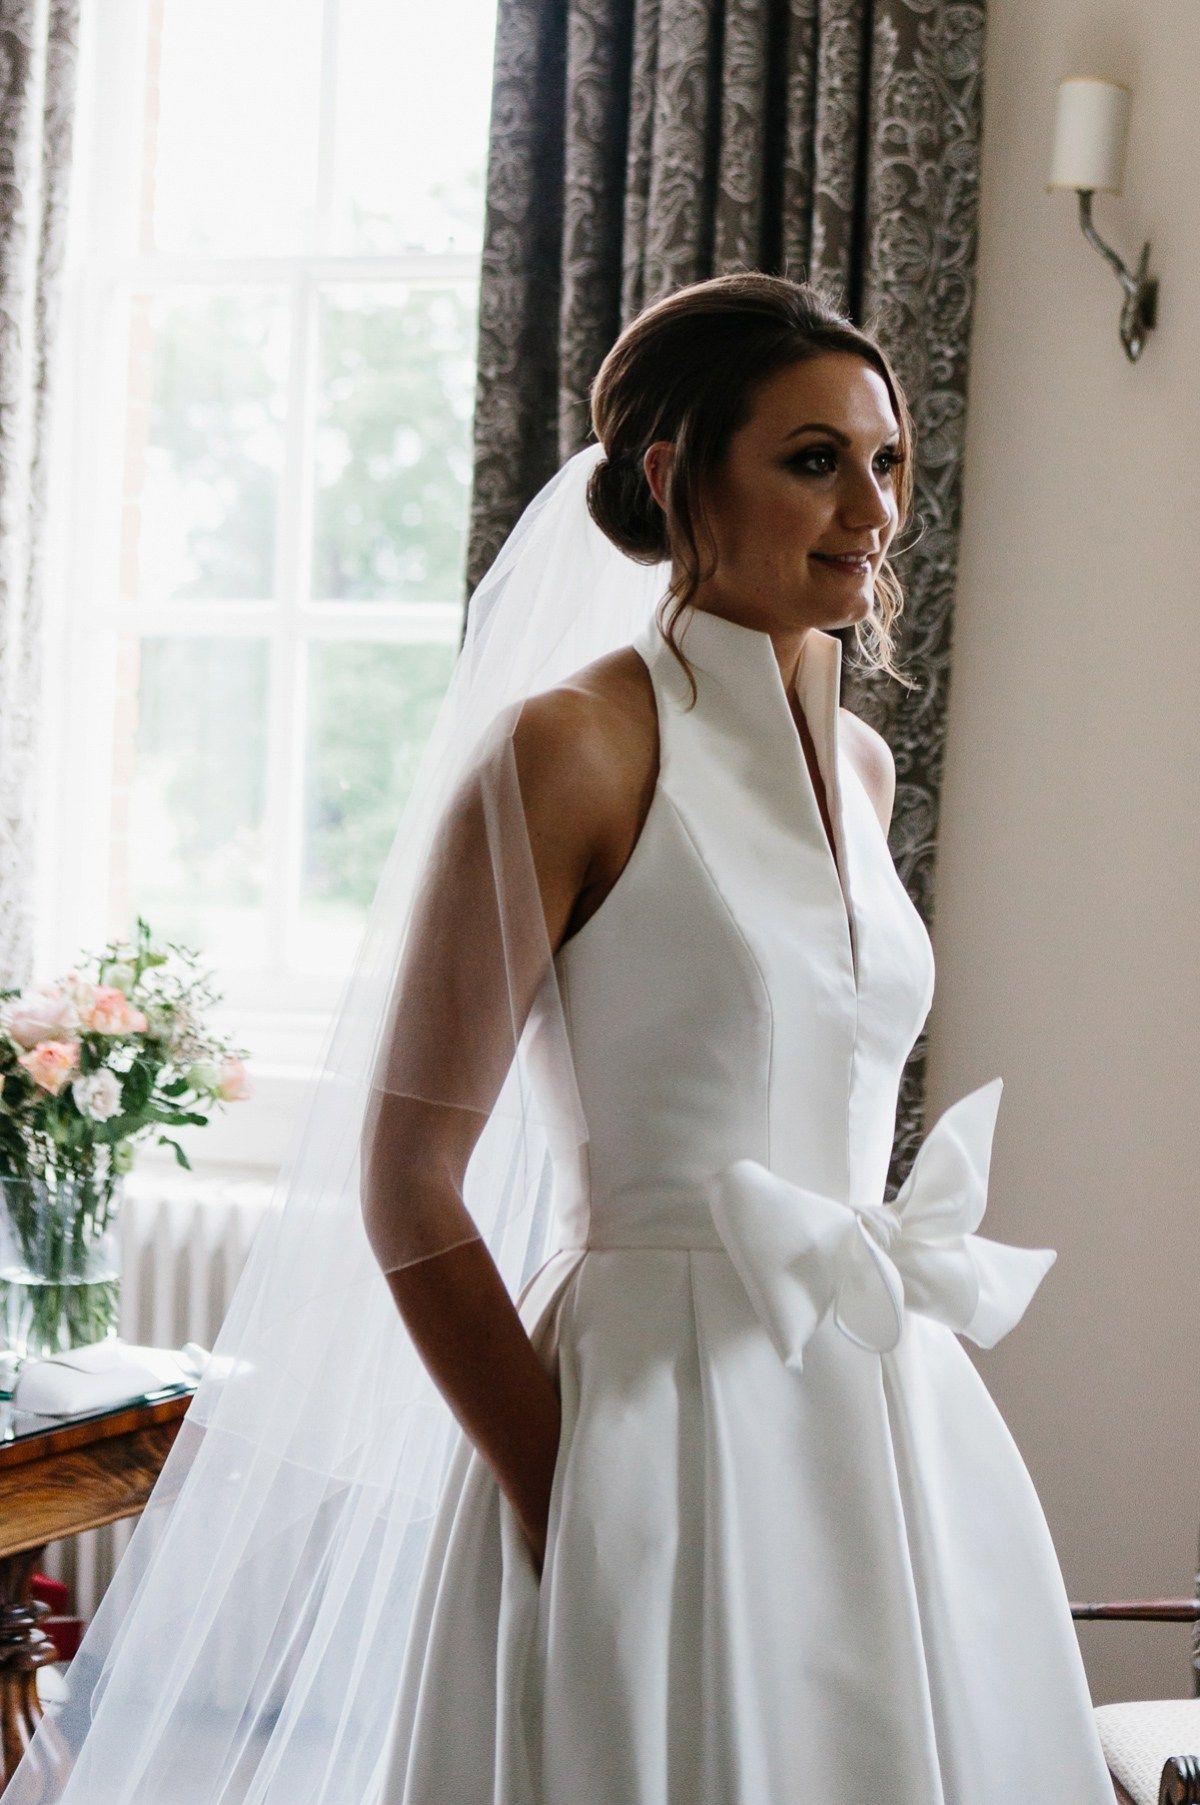 A Halterneck Jesus Peiro Dress For Black Tie Wedding At Iscoyd Park